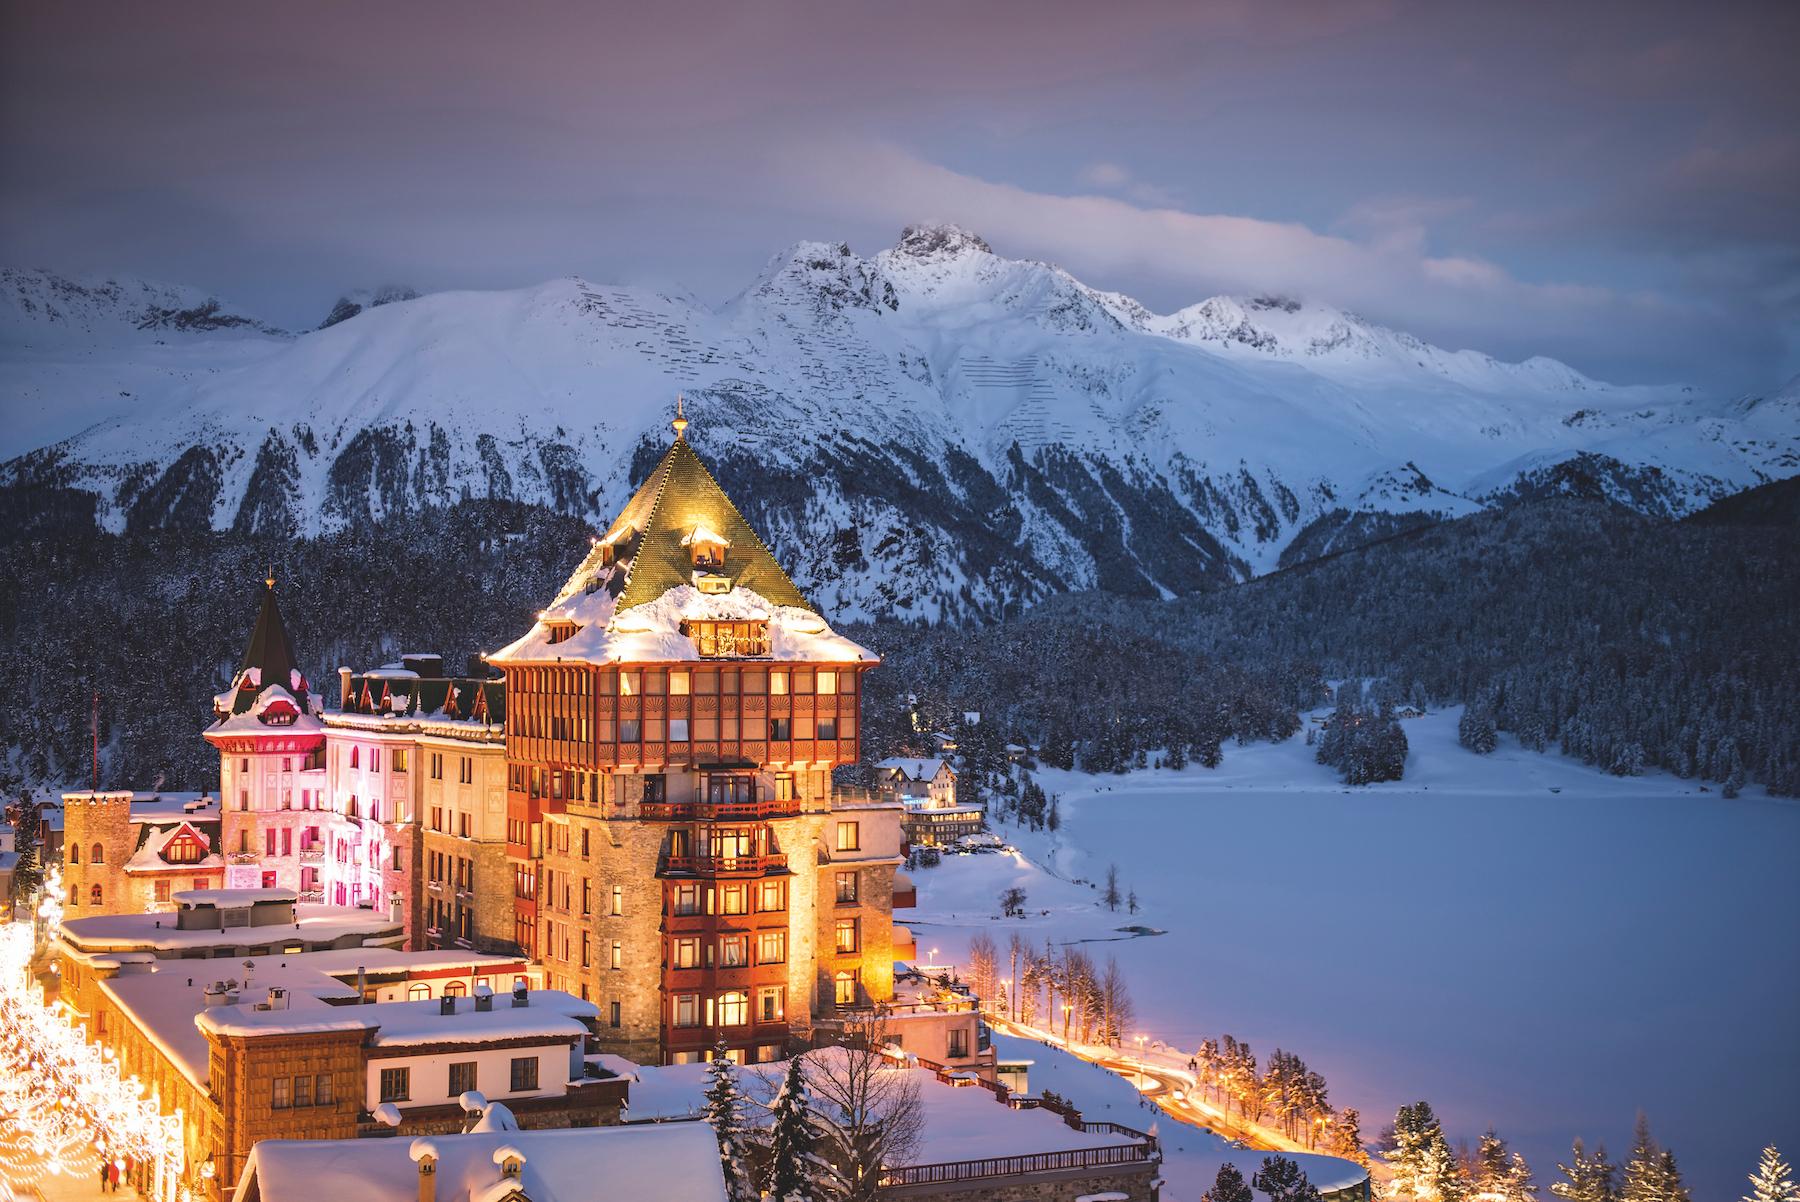 St. Moritz, Badrutts Palace